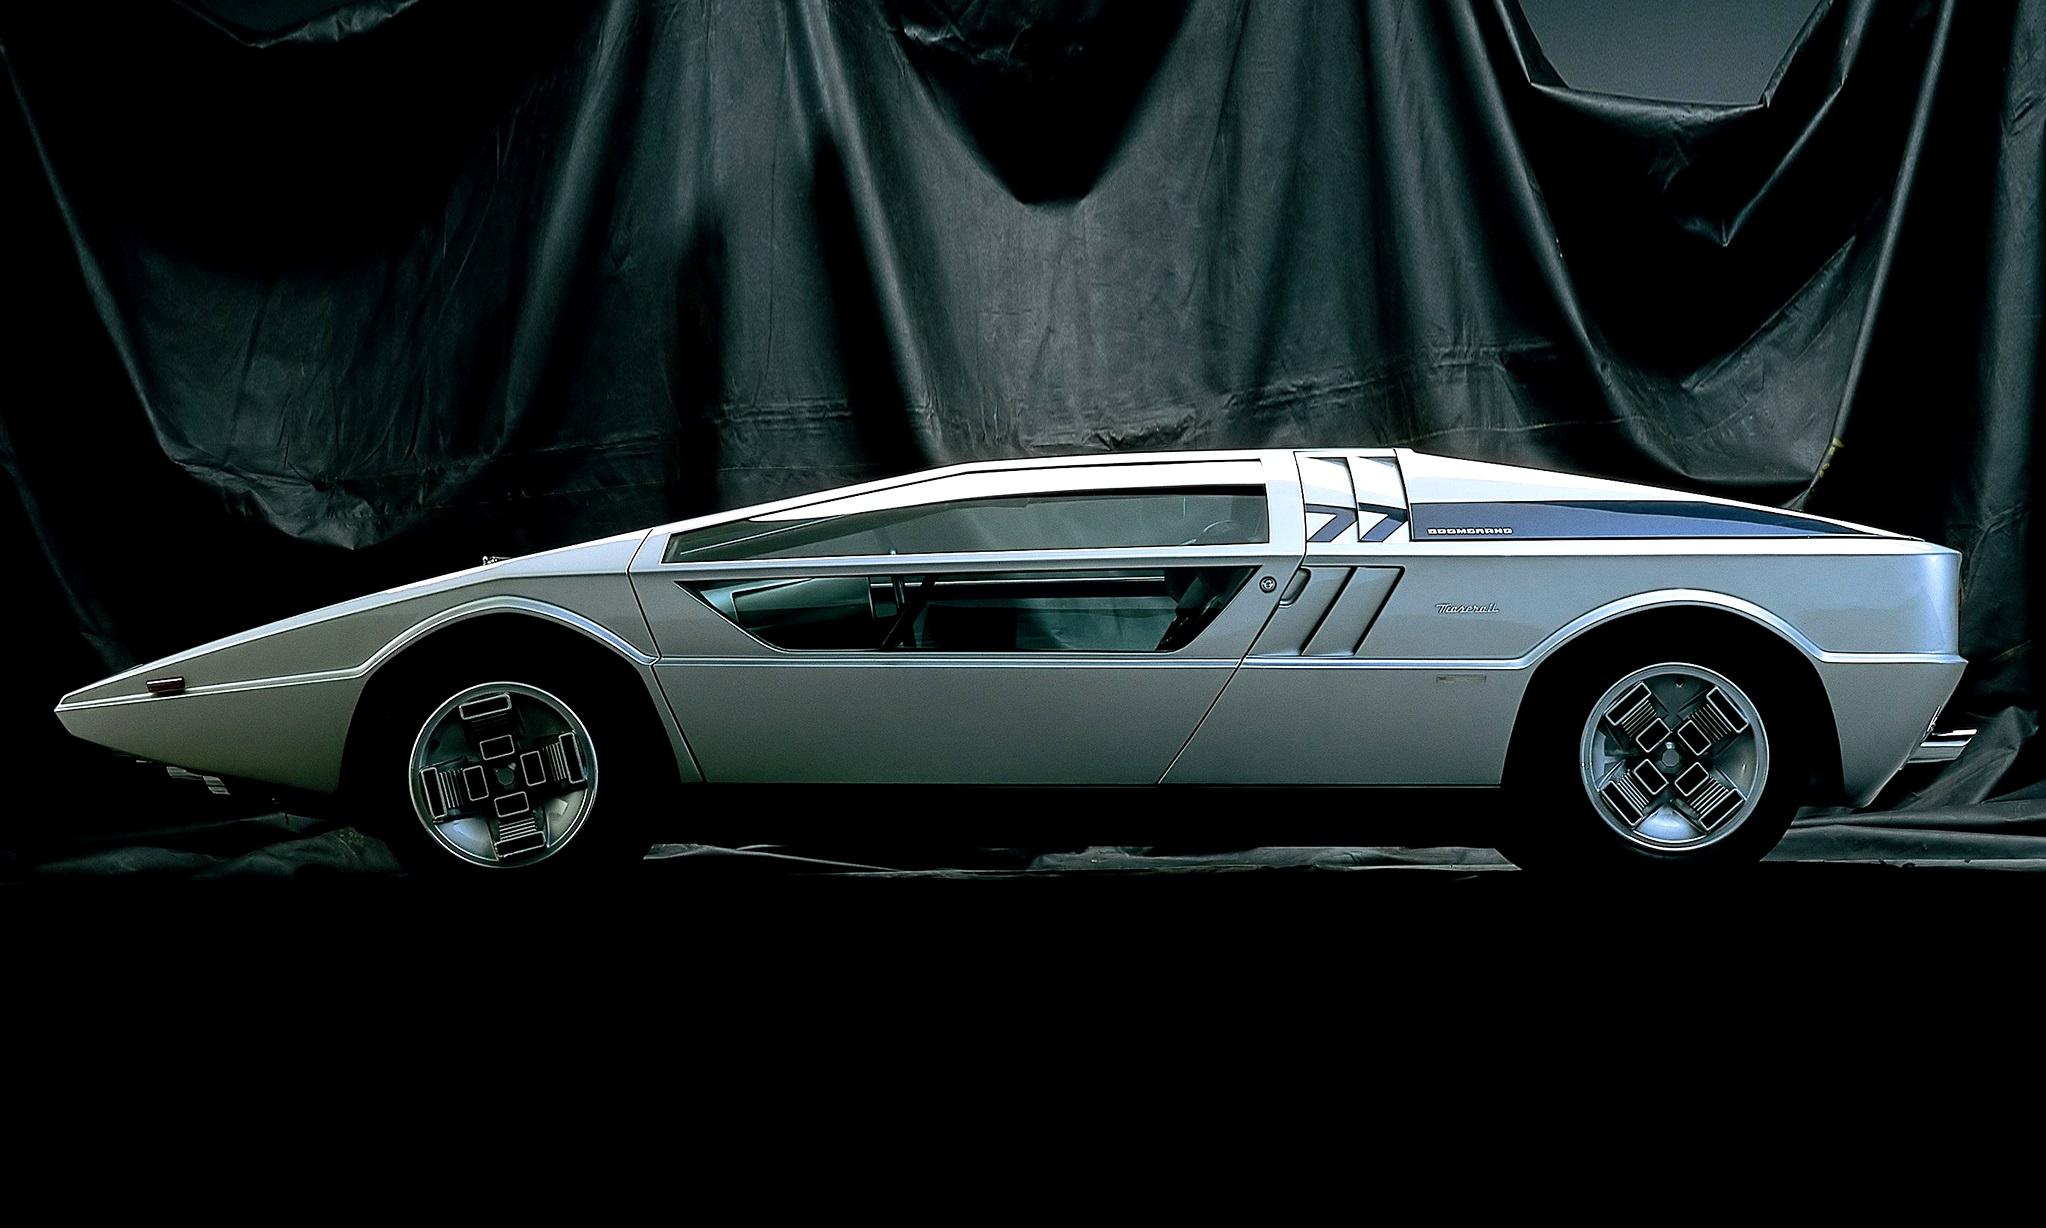 Concept Flashback 1972 Maserati Boomerang Was Production